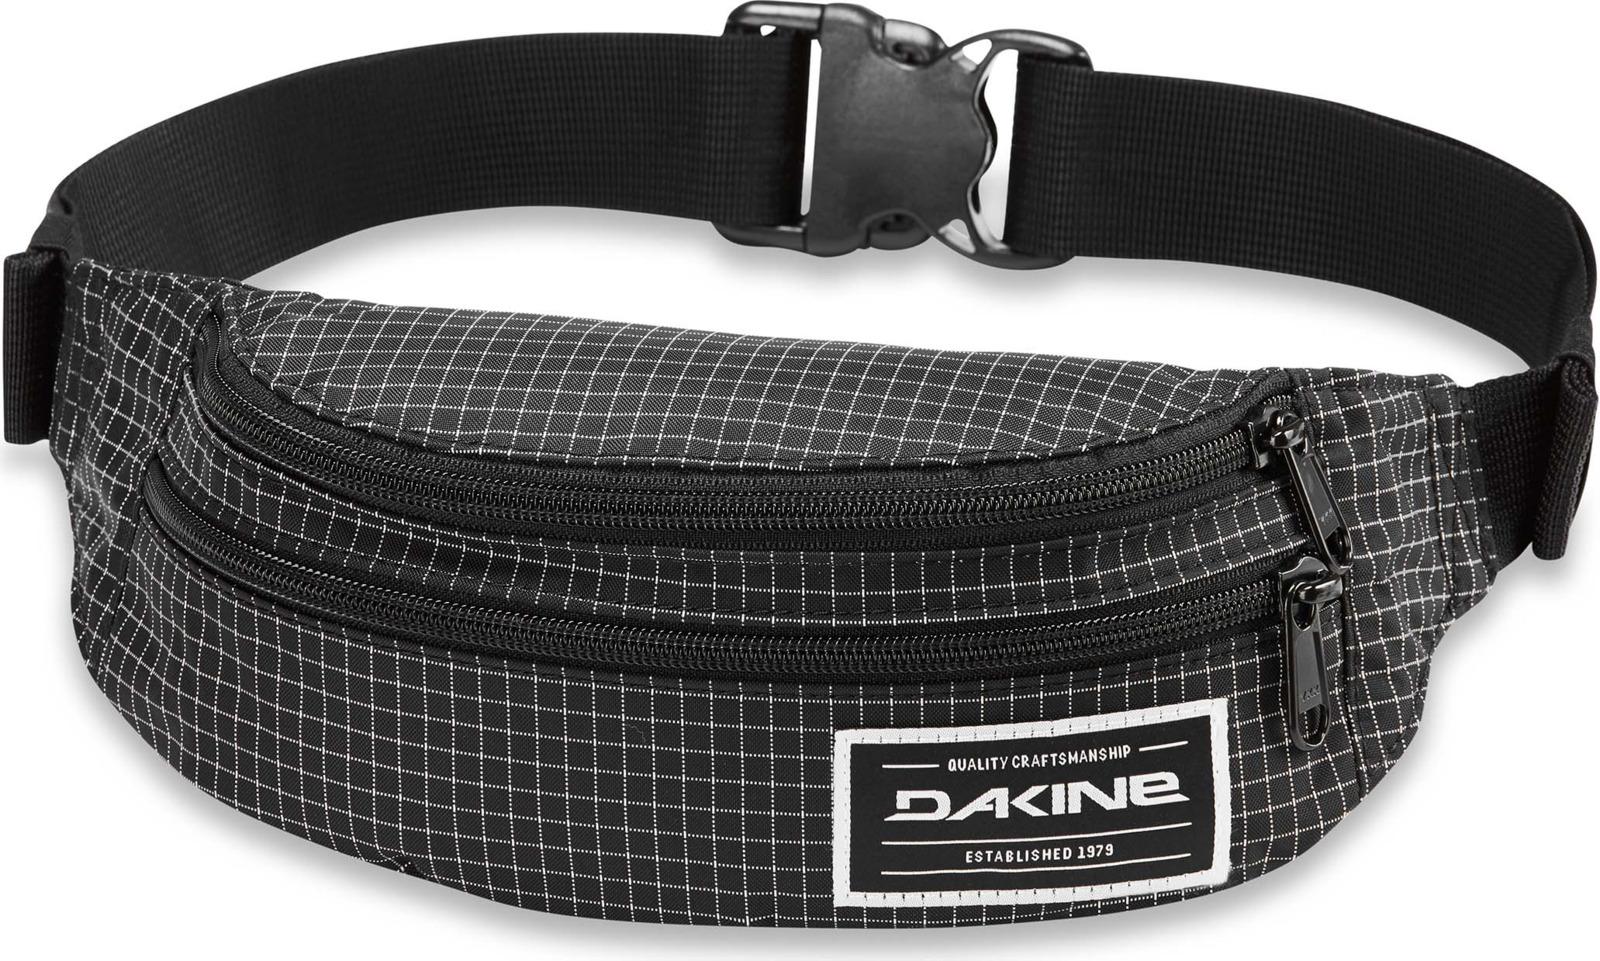 Сумка на пояс Dakine Classic Hip Pack, цвет: черный в клетку, 23 х 15 х 80 см